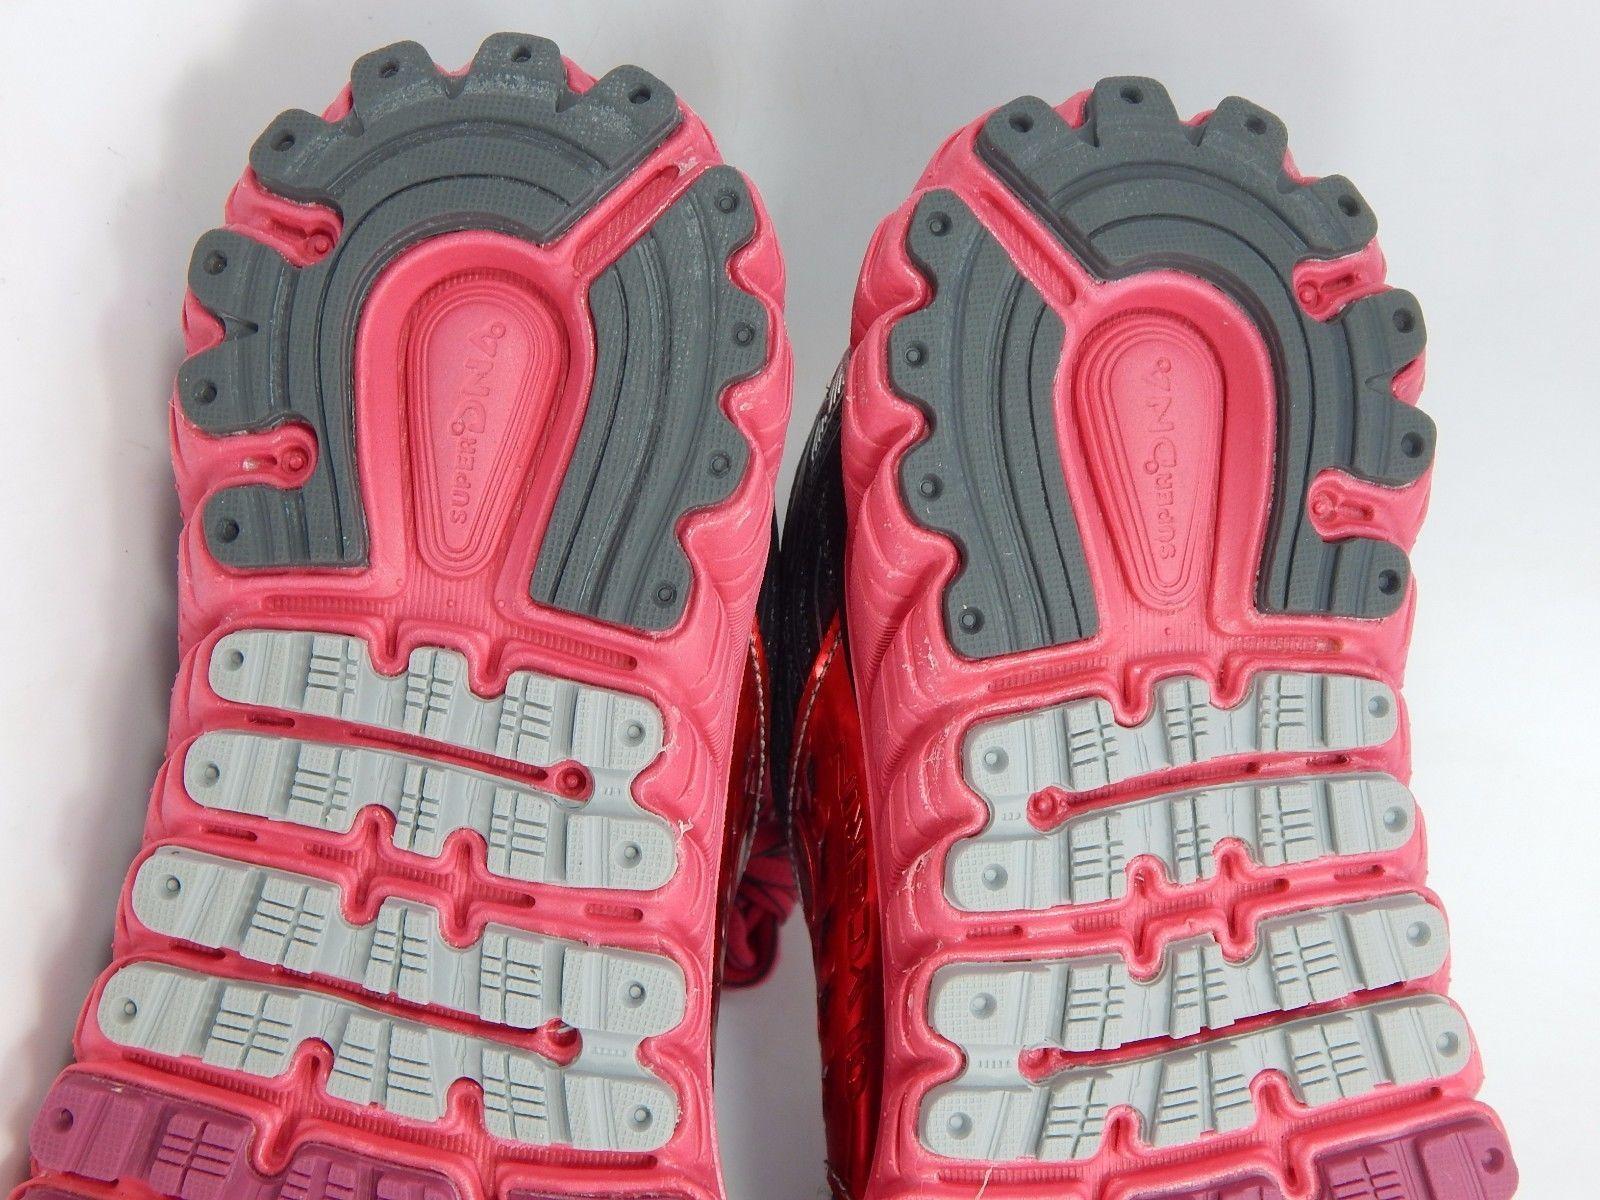 Brooks Glycerin 14 Women's Running Shoes Sz US 6 M (B) EU 36.5 Gray 1202171B093